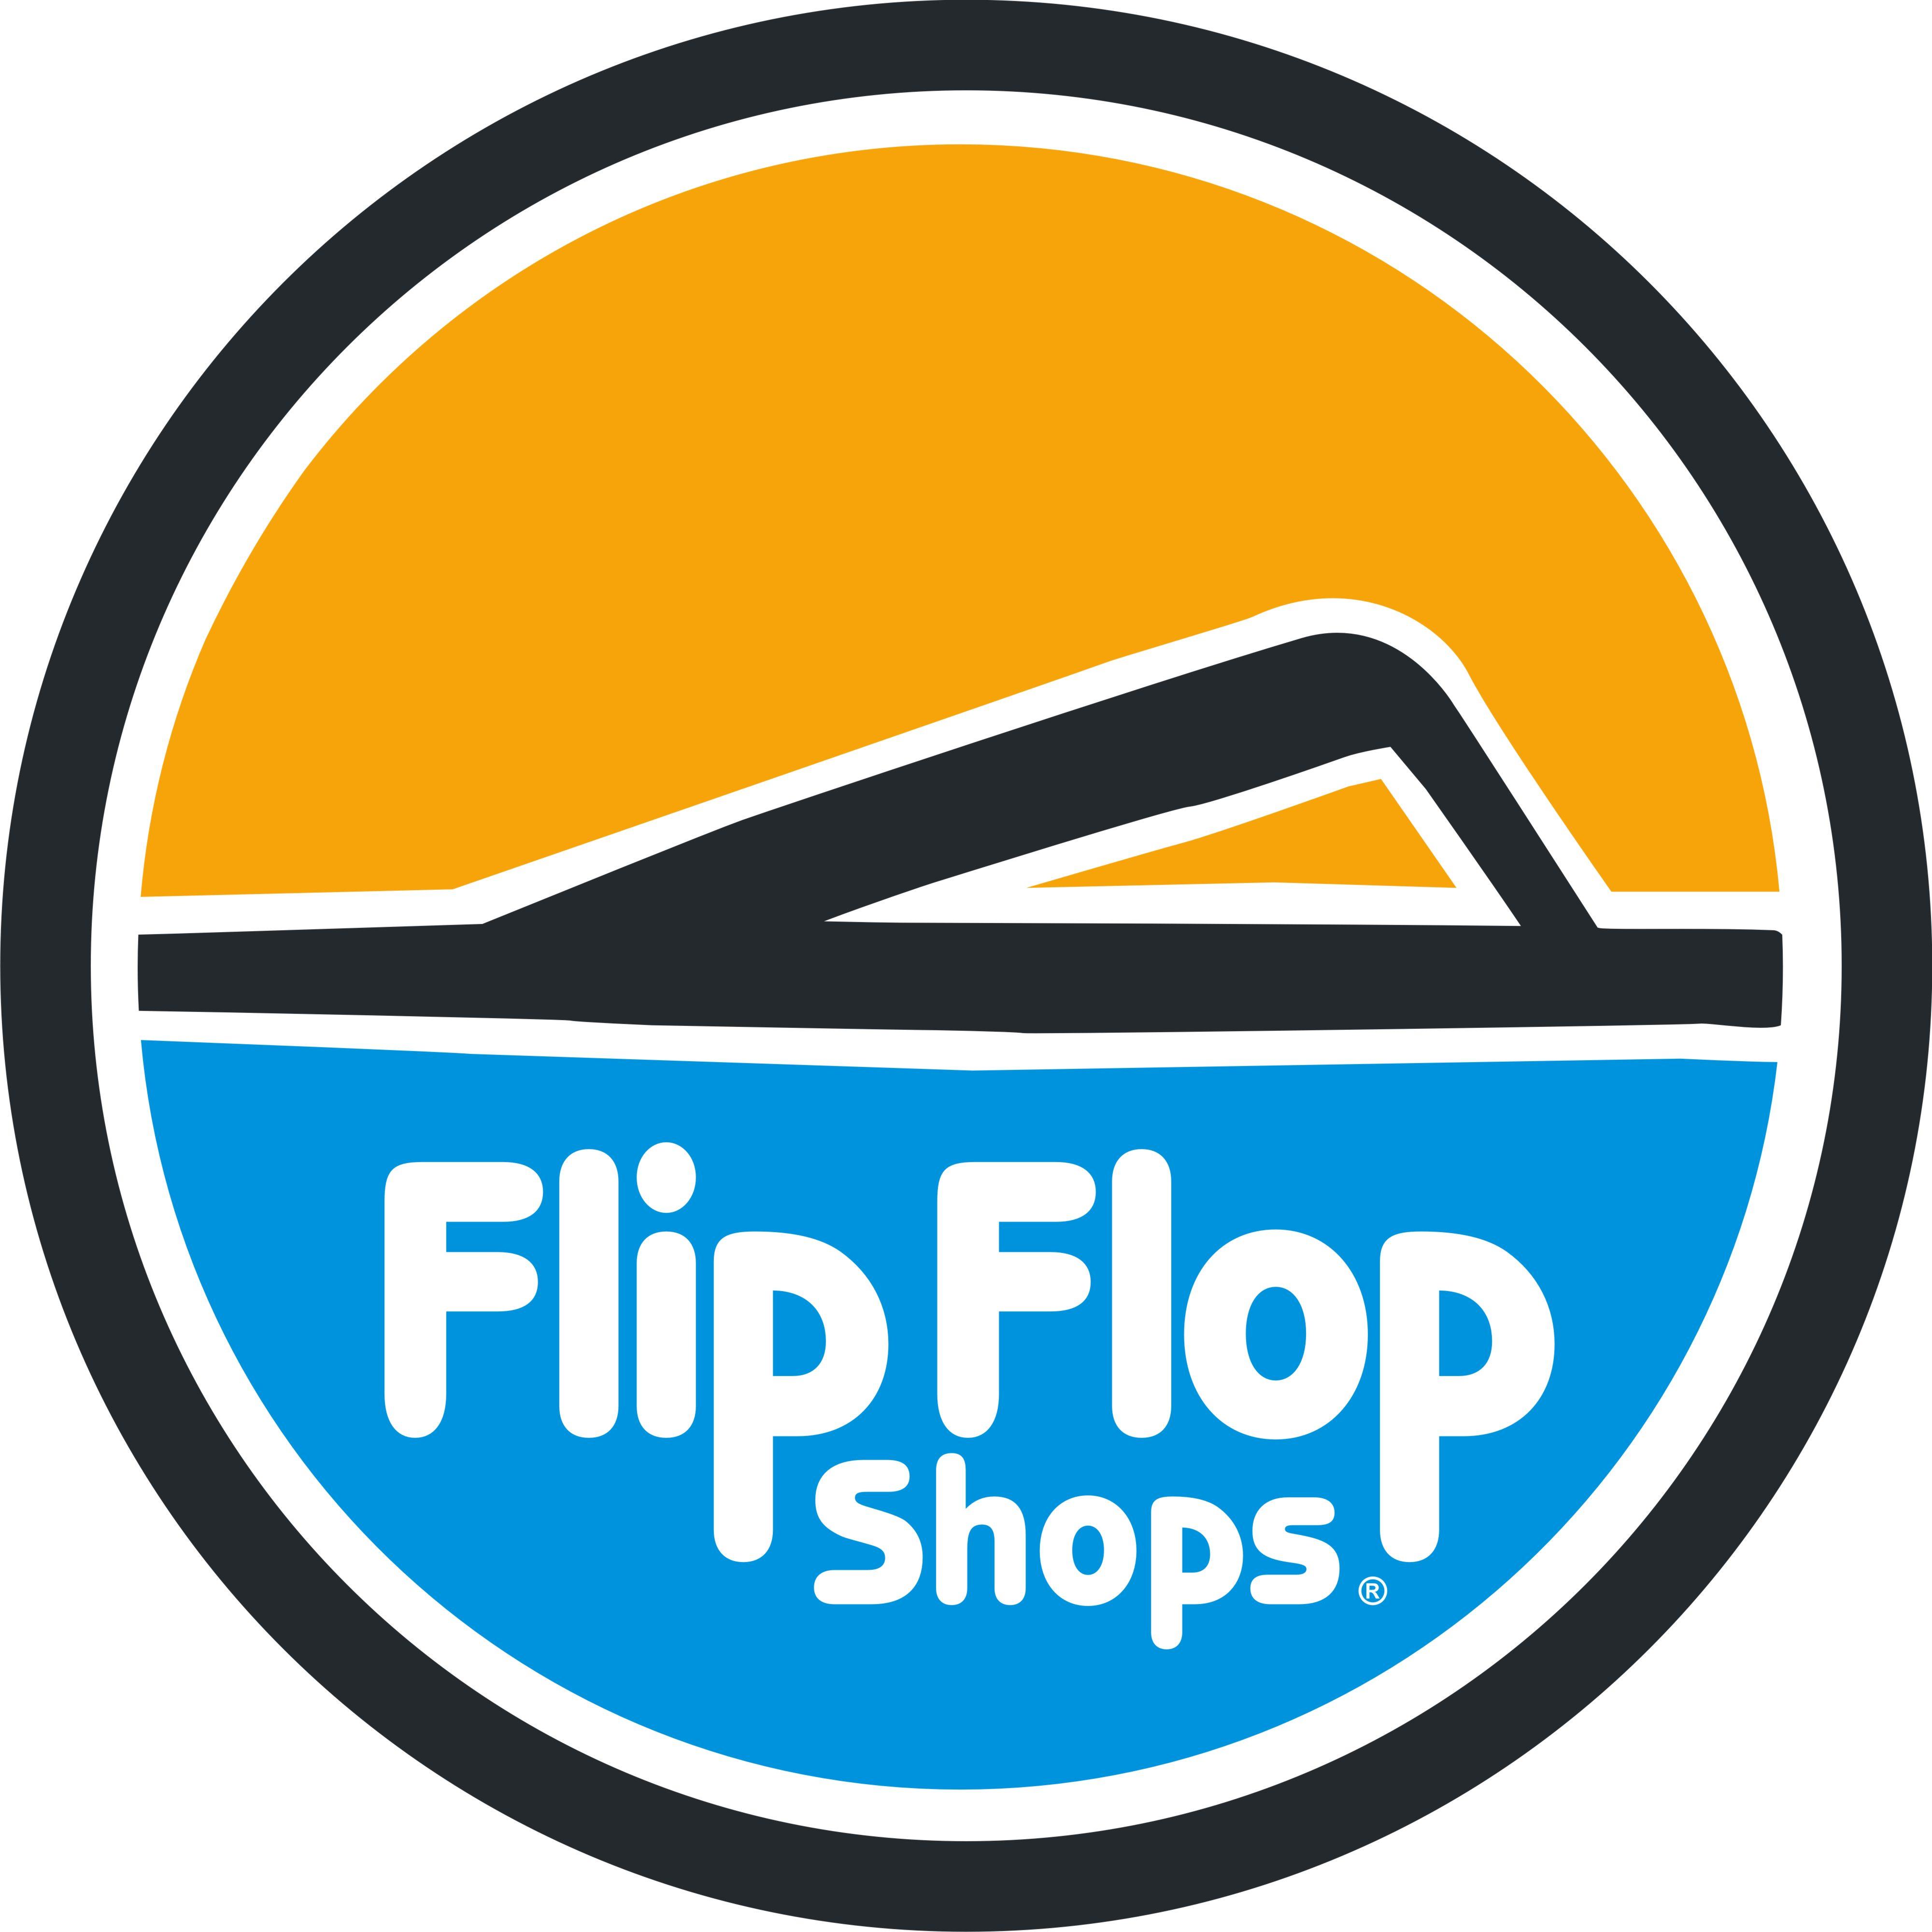 Flip flop shops steps into top 10 percentile on inc 500 i for 18 8 salon franchise